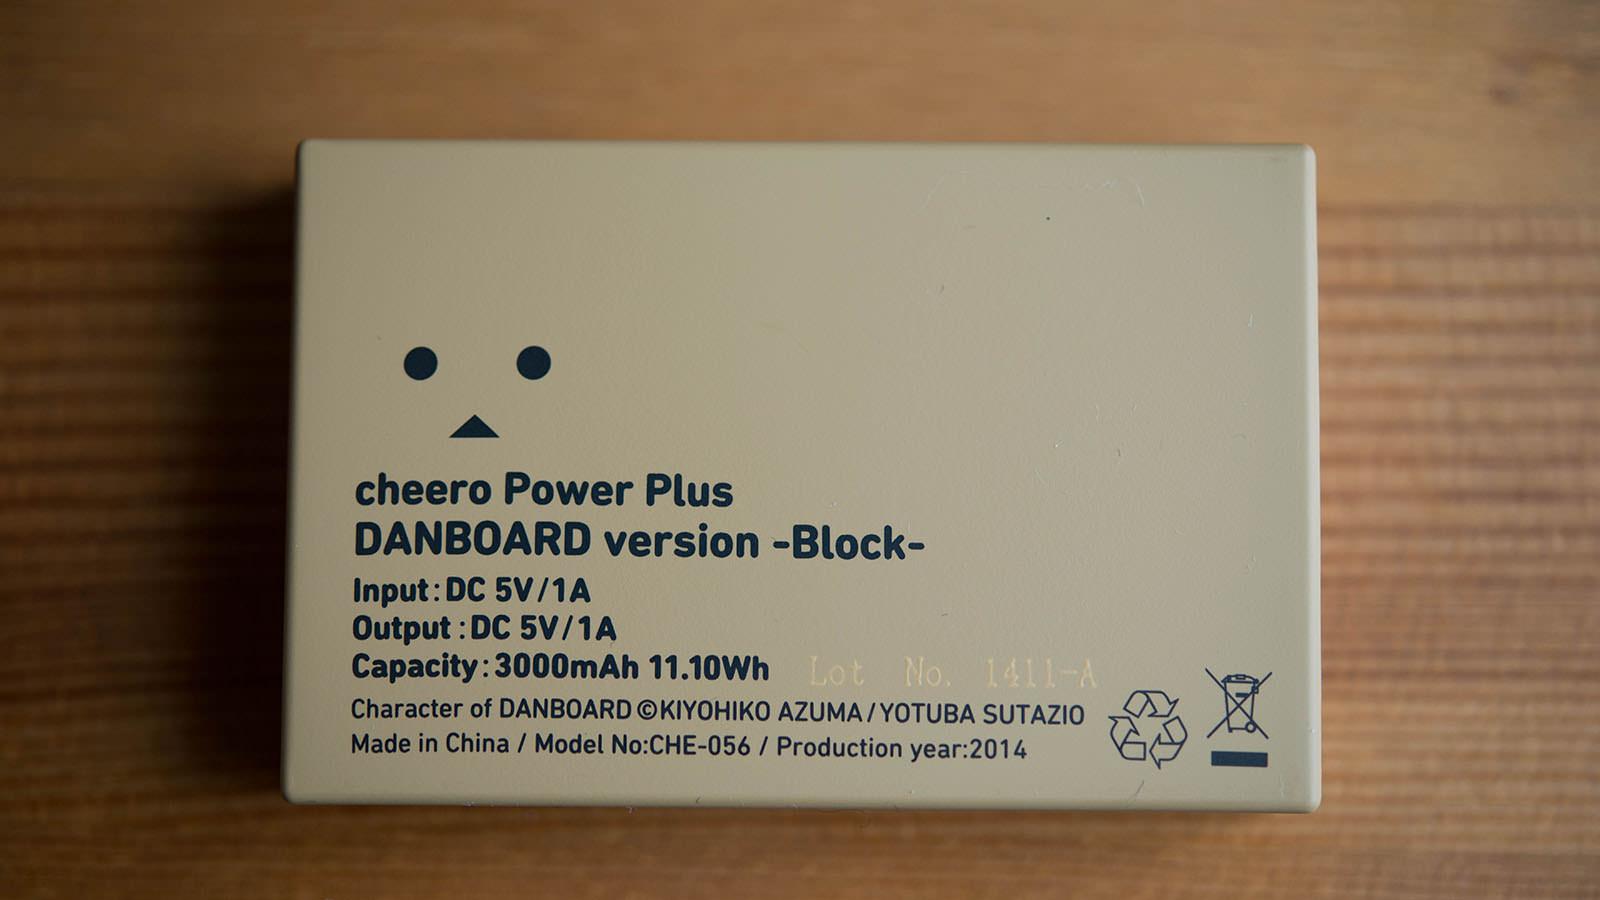 cheero Power Plus DANBOARD version block review_05